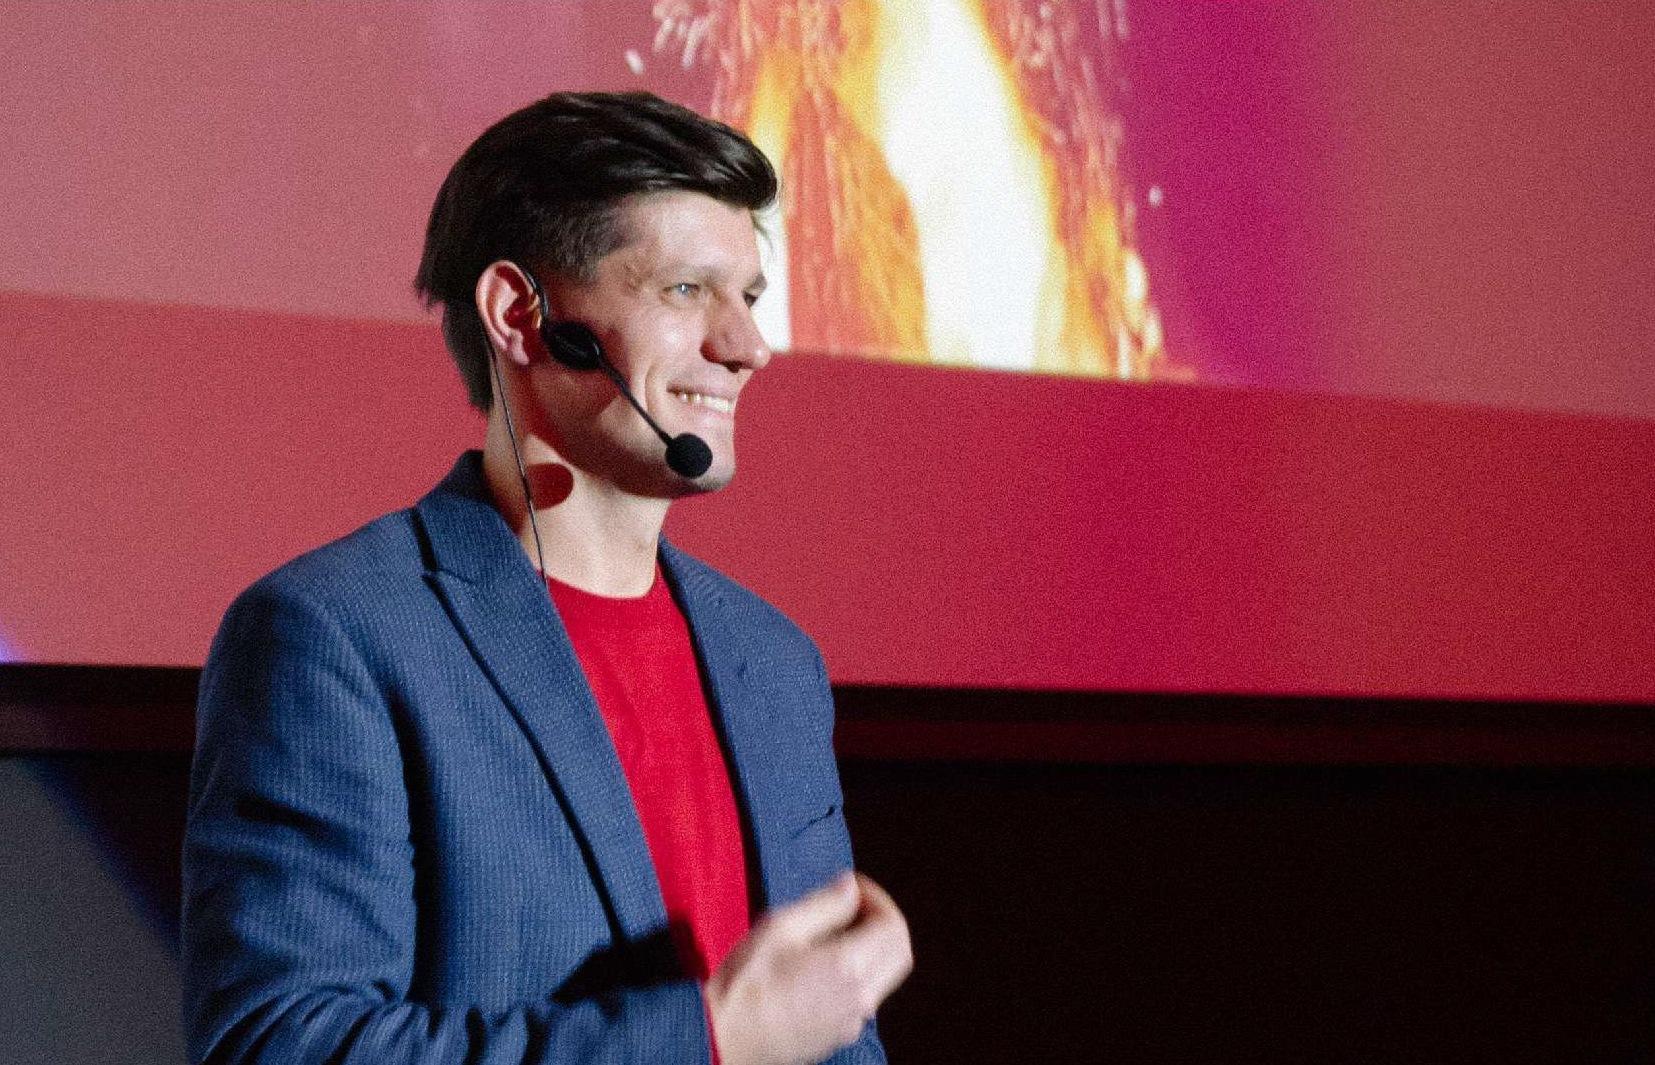 Бизнес-эксперт Андрей Пометун рассказал, какой бизнес переживет коронакризис - новости Афанасий